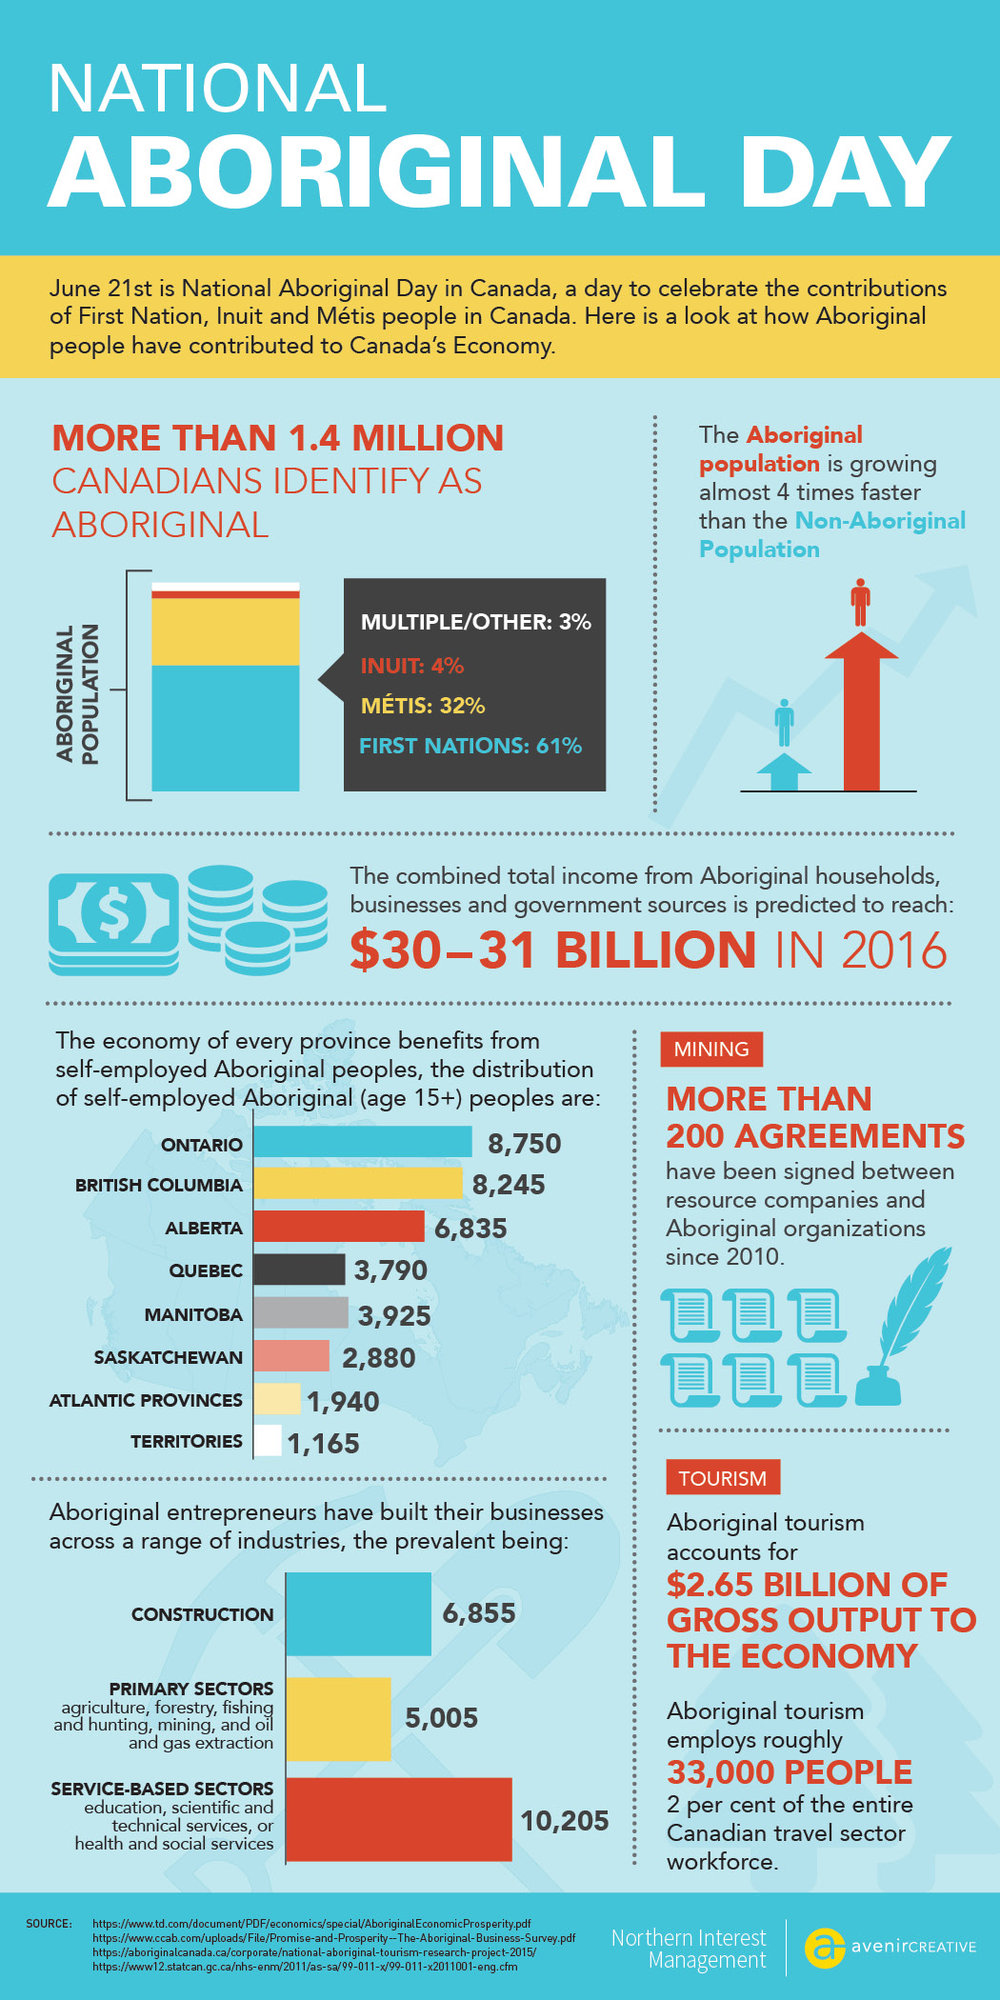 avenircreative-Aboriginal-Day-Infographic.jpg